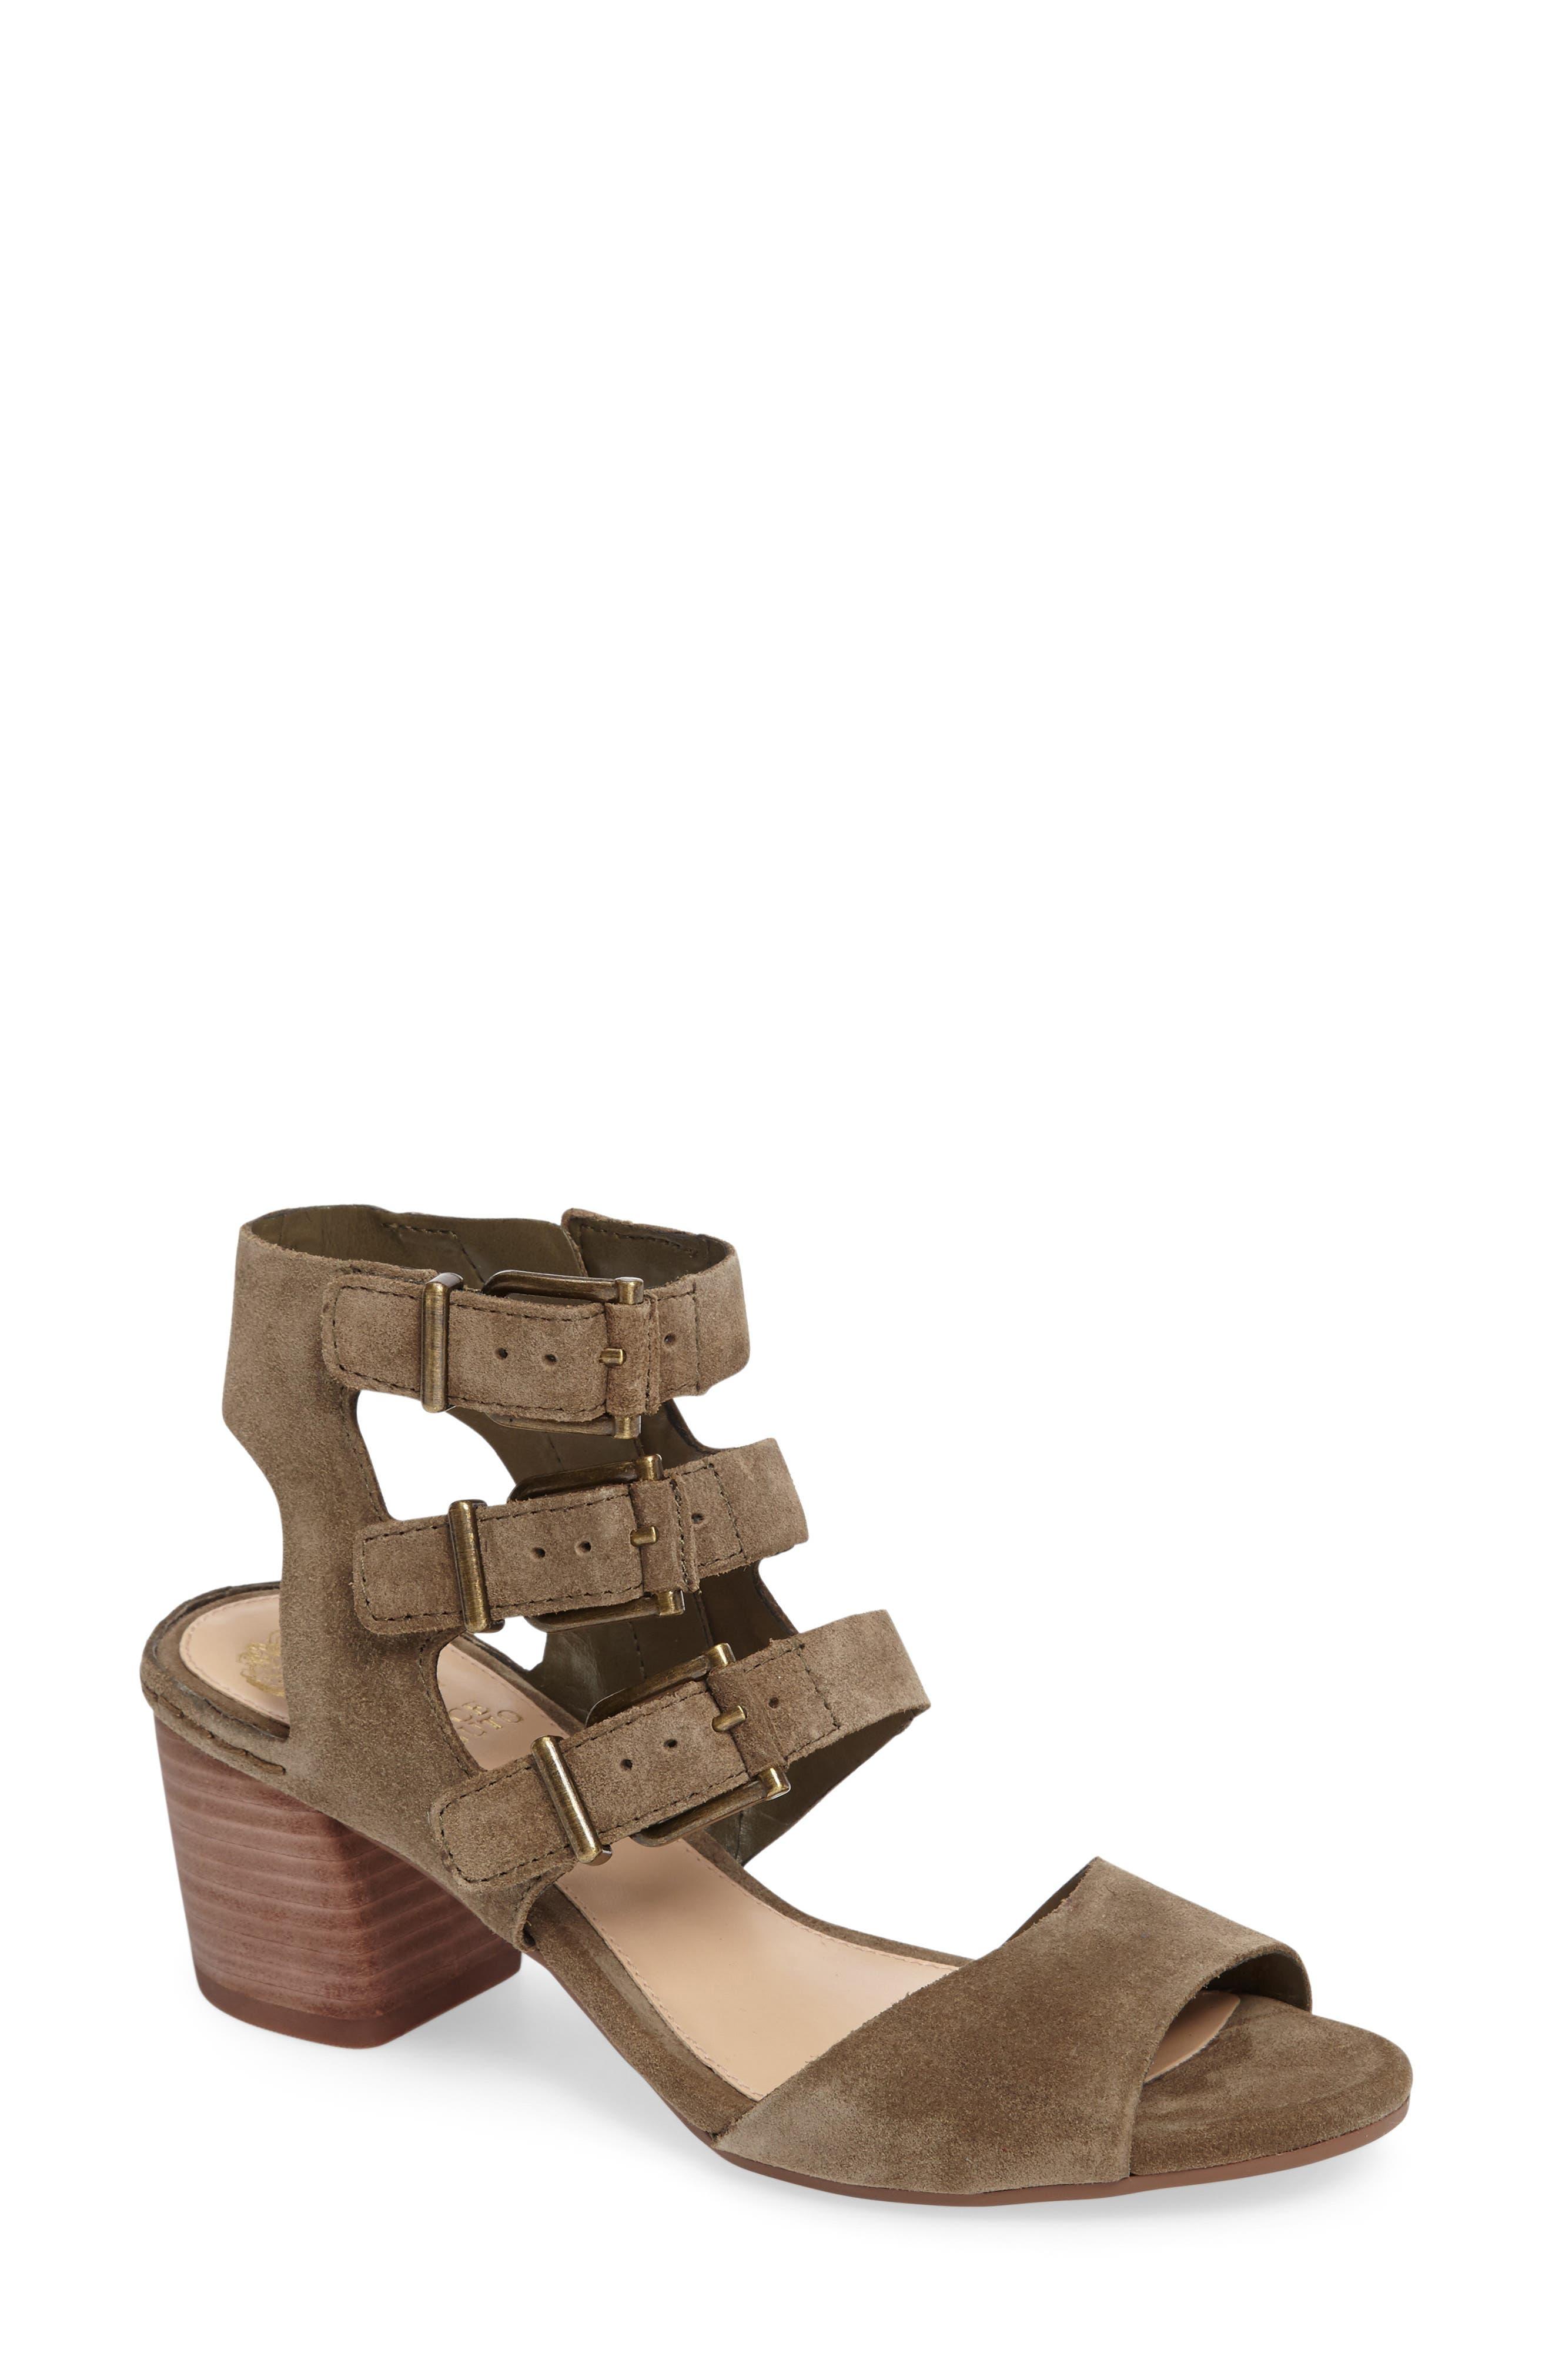 VINCE CAMUTO Geriann Strappy Slingback Sandal